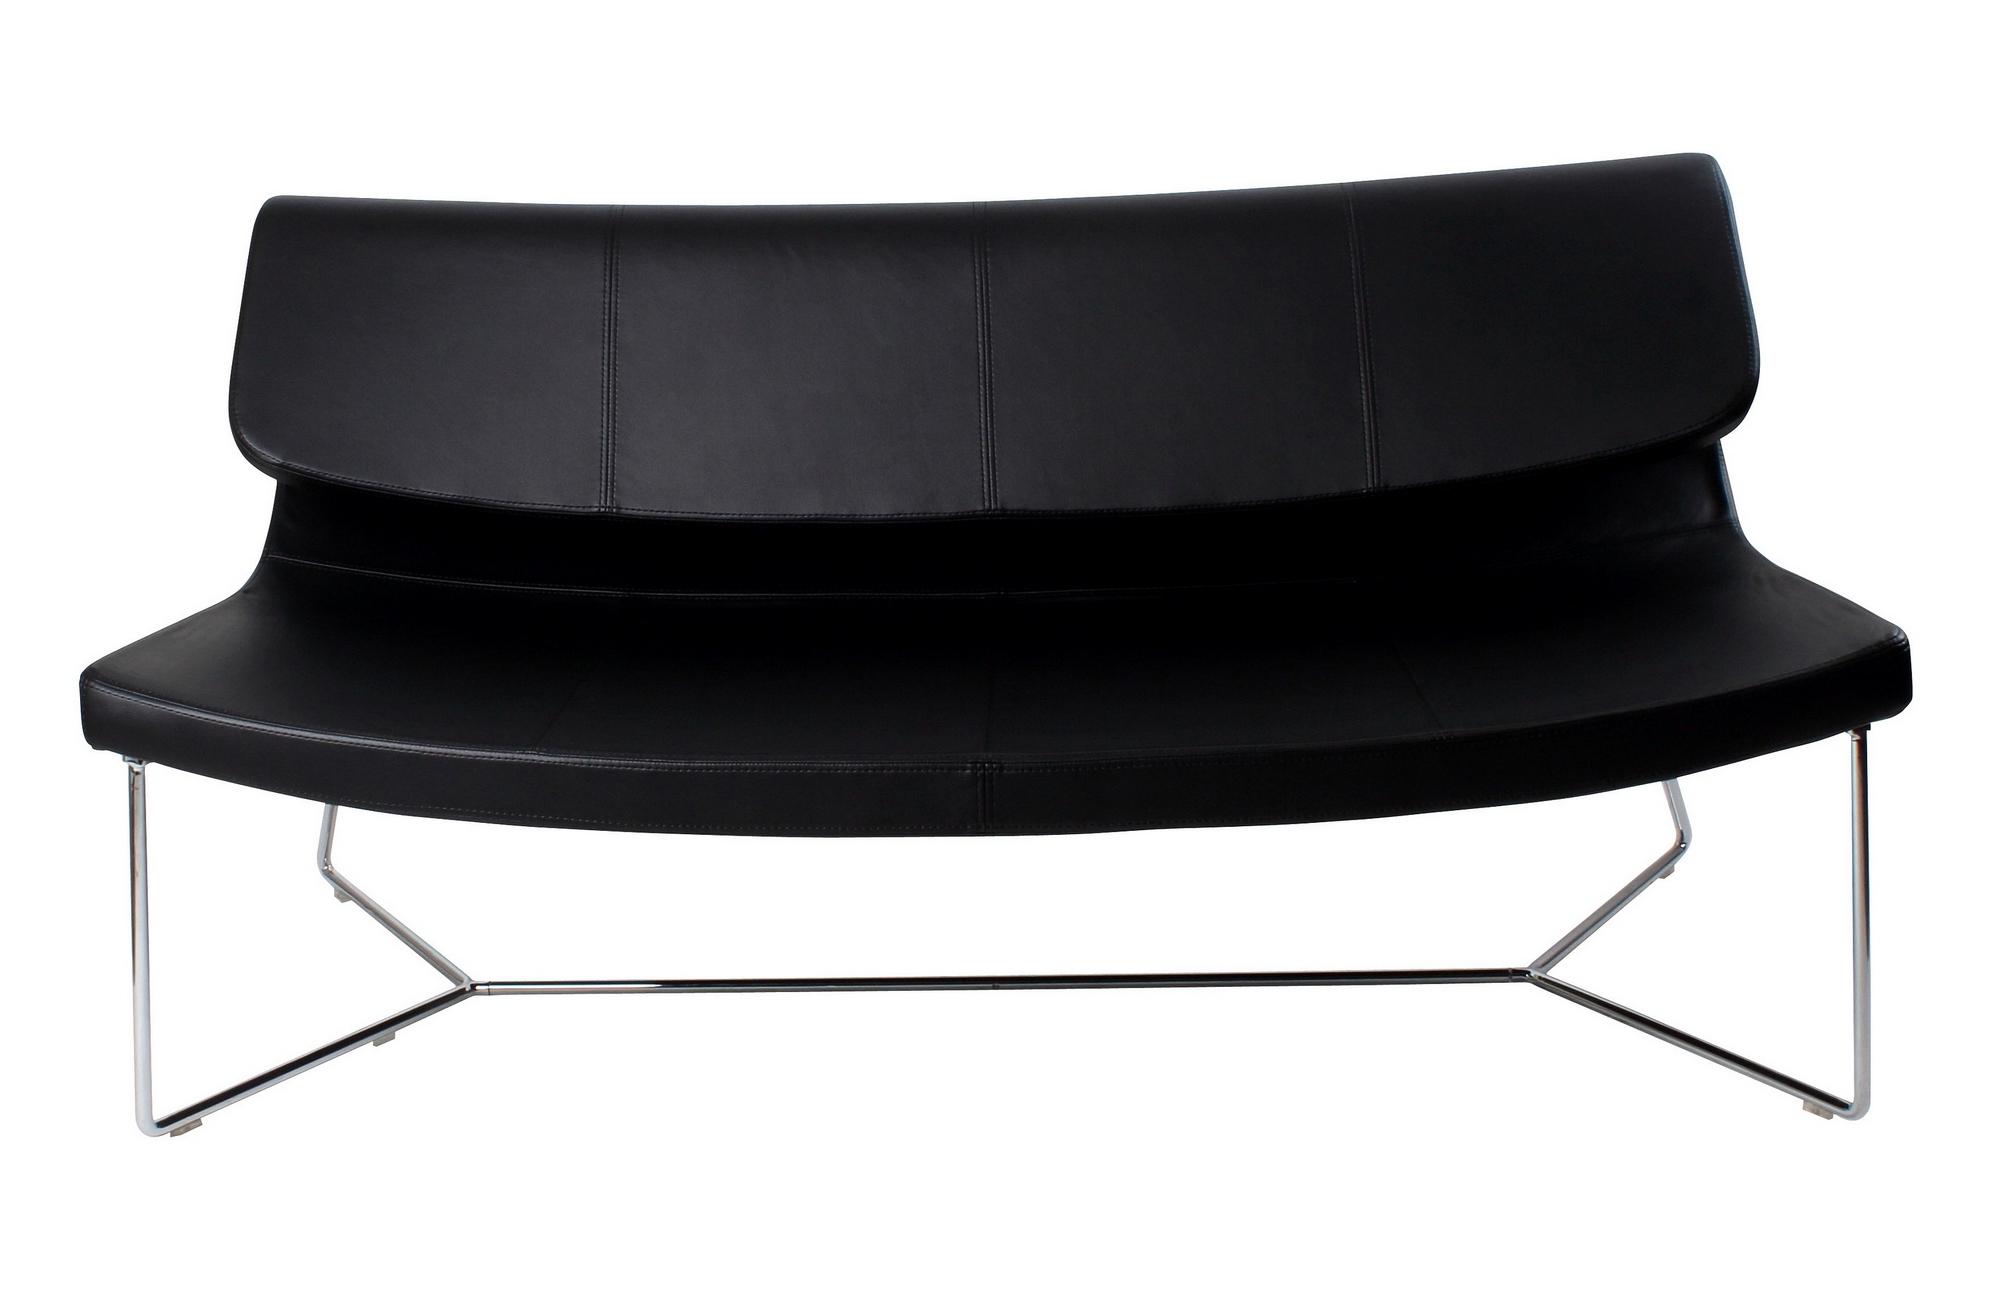 2019 Brennan Sofa Black Leatherette With Brennan Sofa Chairs (Gallery 19 of 20)